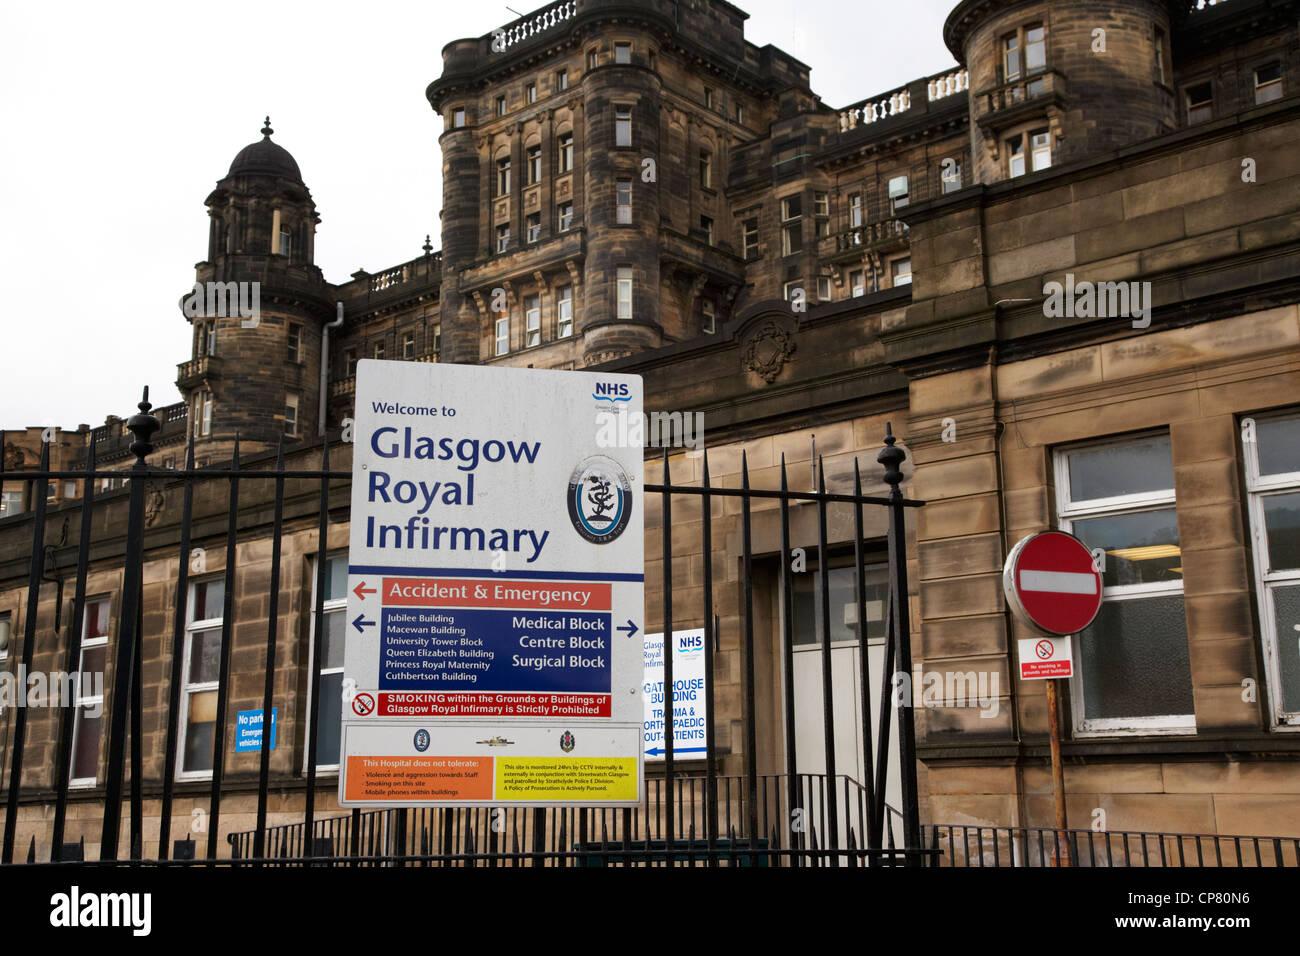 Glasgow Royal Infirmary NHS teaching hospital Scotland UK - Stock Image